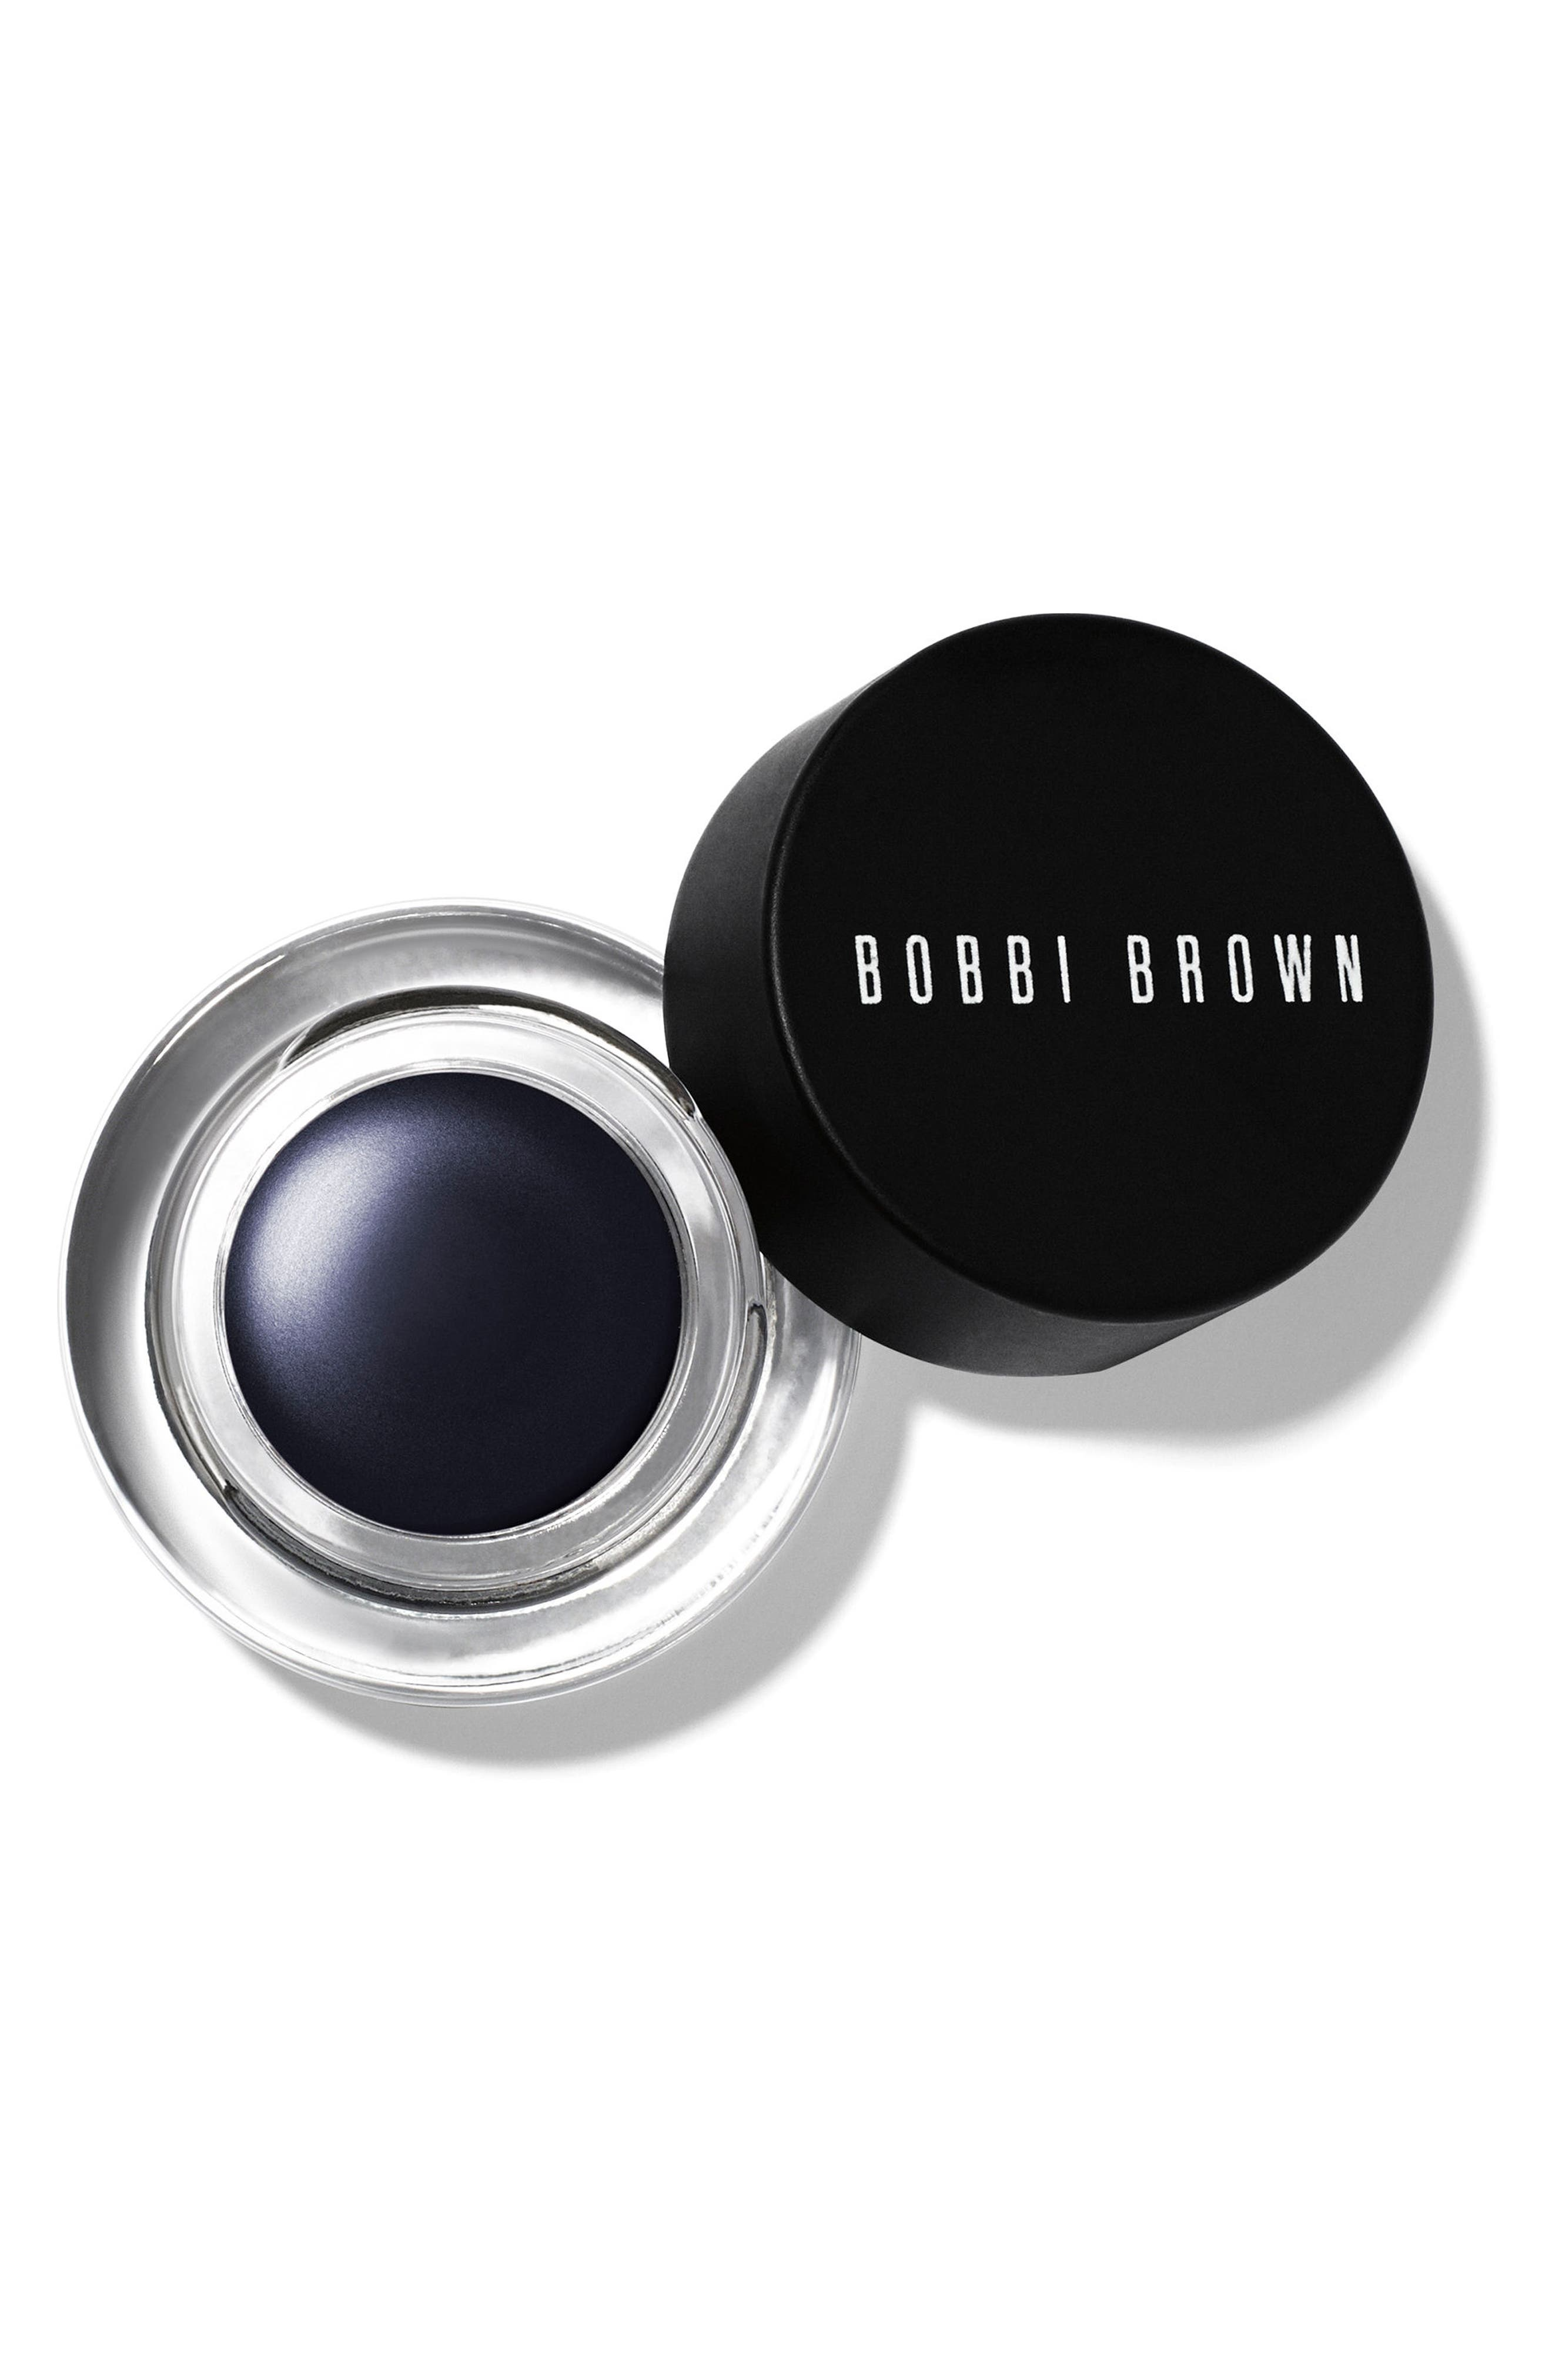 Bobbi Brown Long-Wear Gel Eyeliner - Cobalt Ink